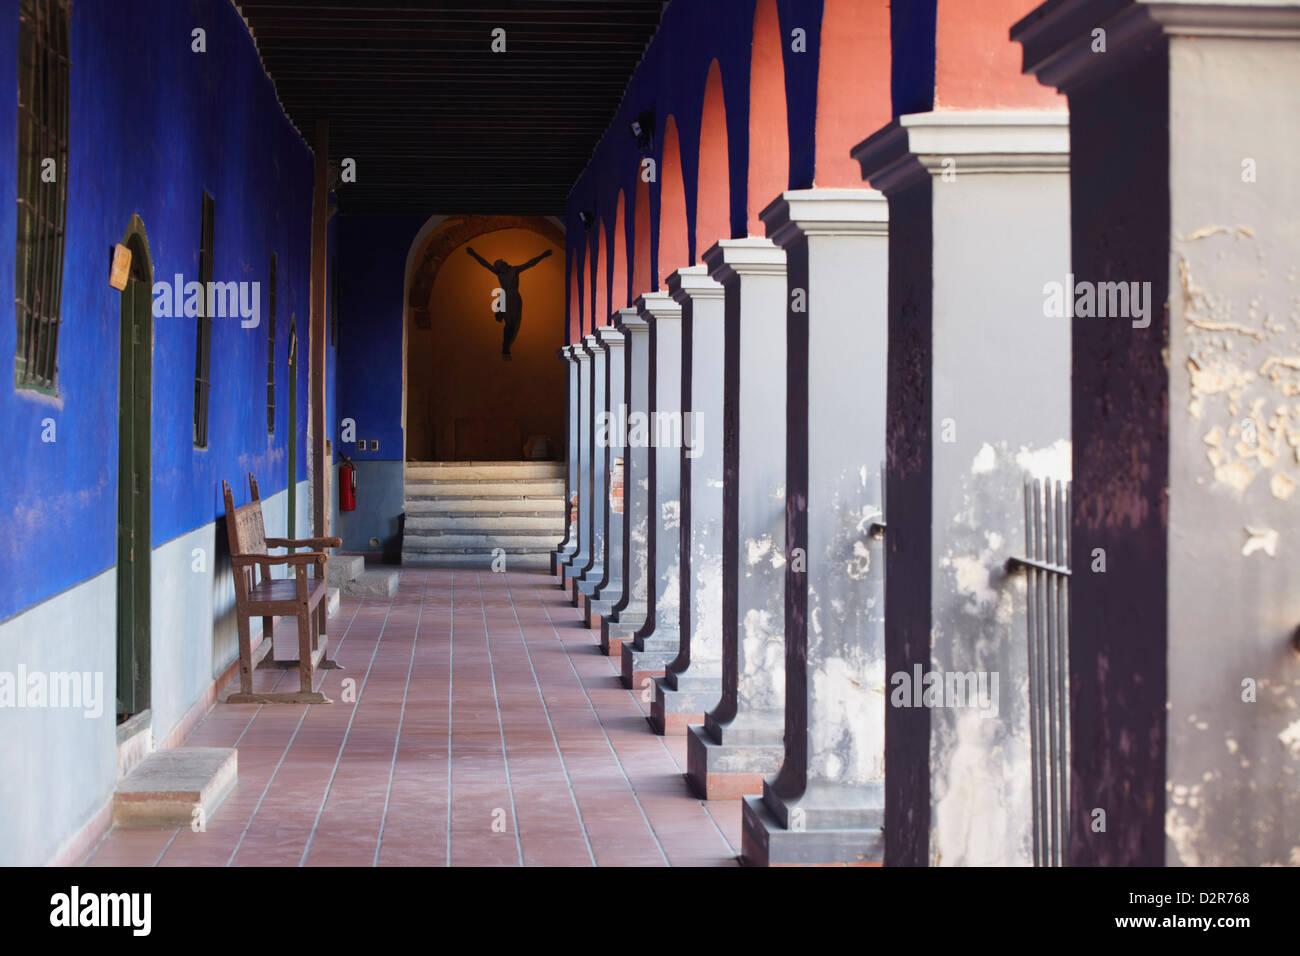 Corridor of San Francisco Museum inside San Francisco Church, La Paz, Bolivia, South America - Stock Image